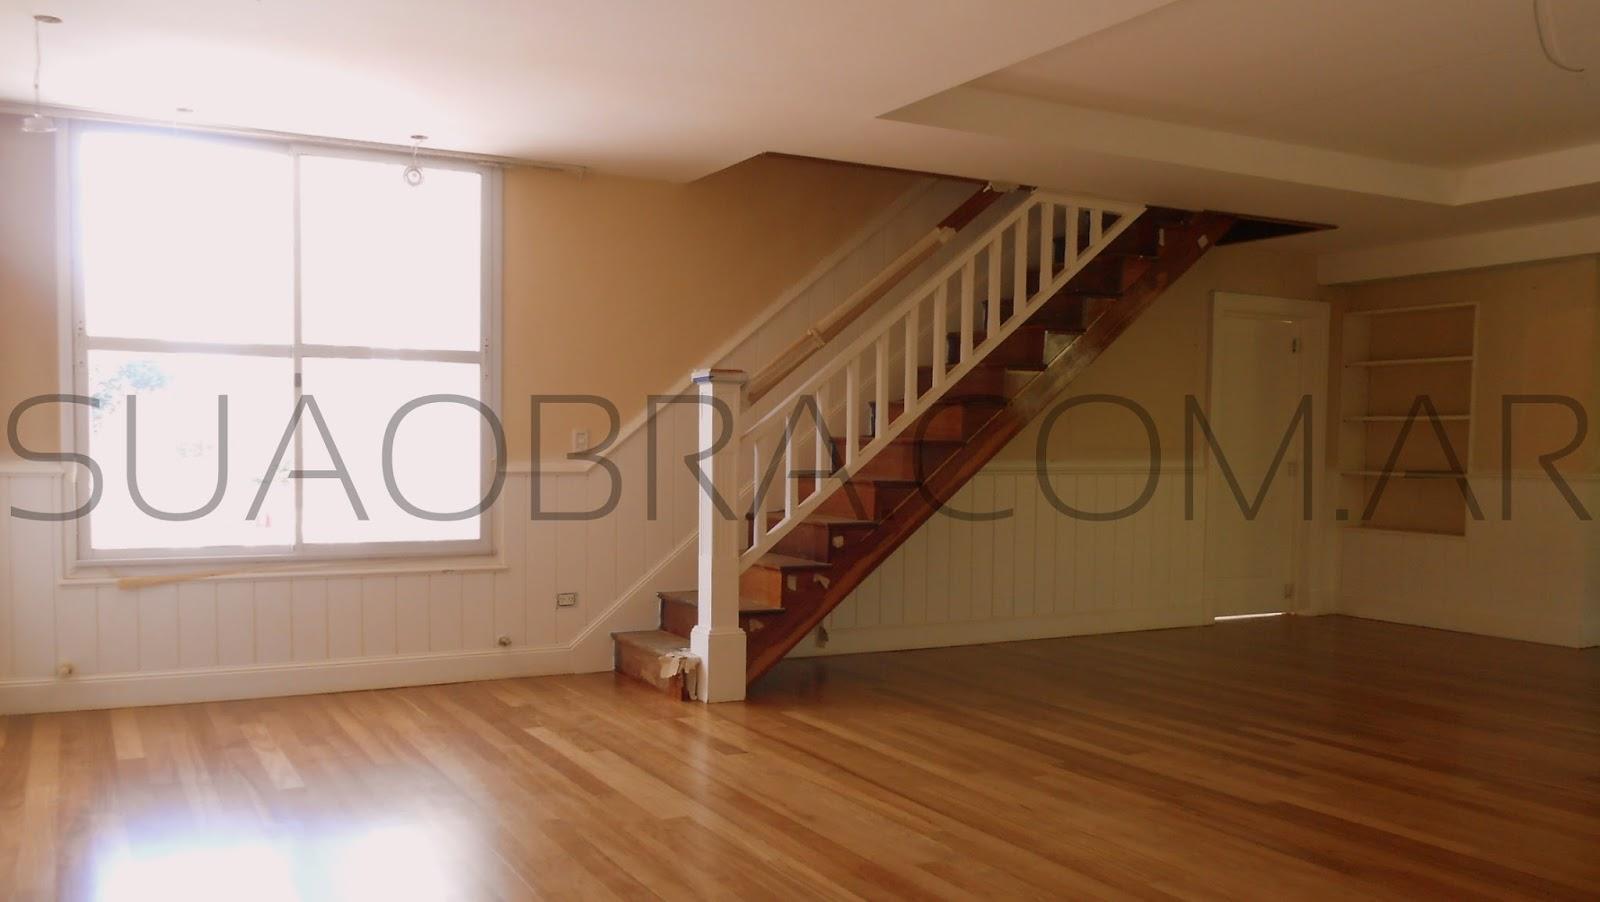 Pintura residencial pintura interior refacci n - Pintura interior barata ...